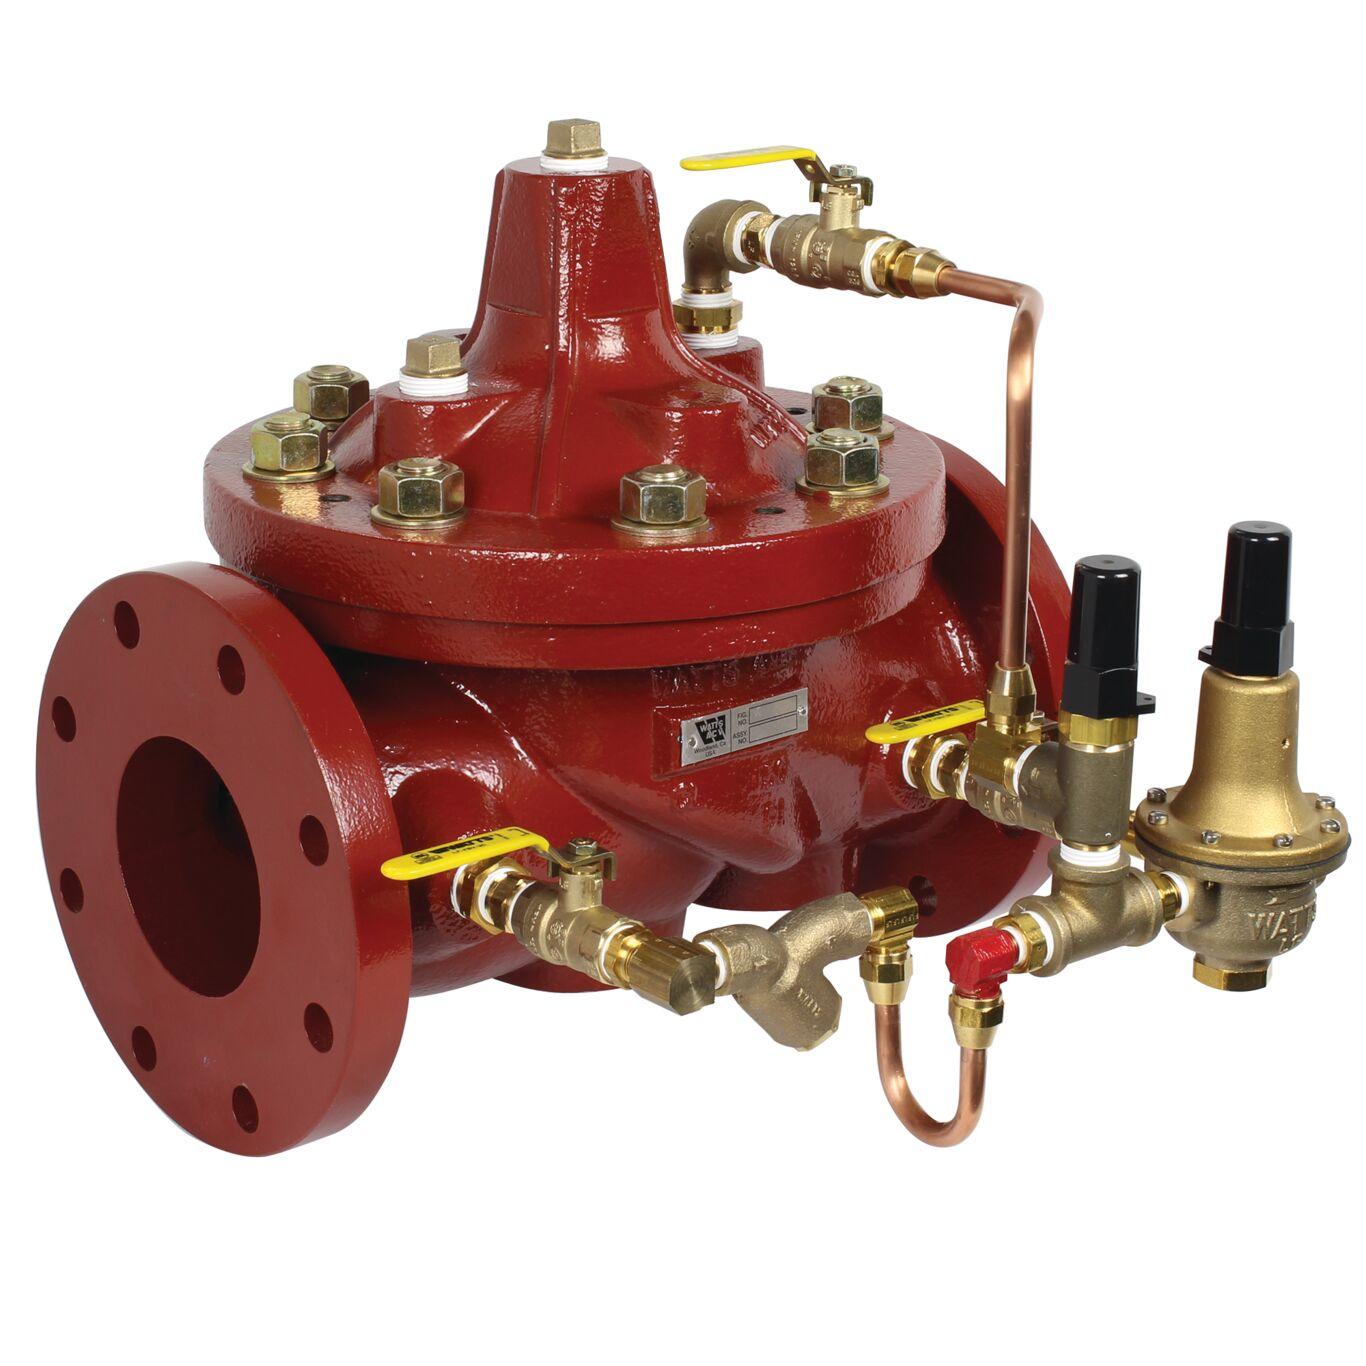 Pressure Regulator For Cutting Machine Gas Circuit Control View